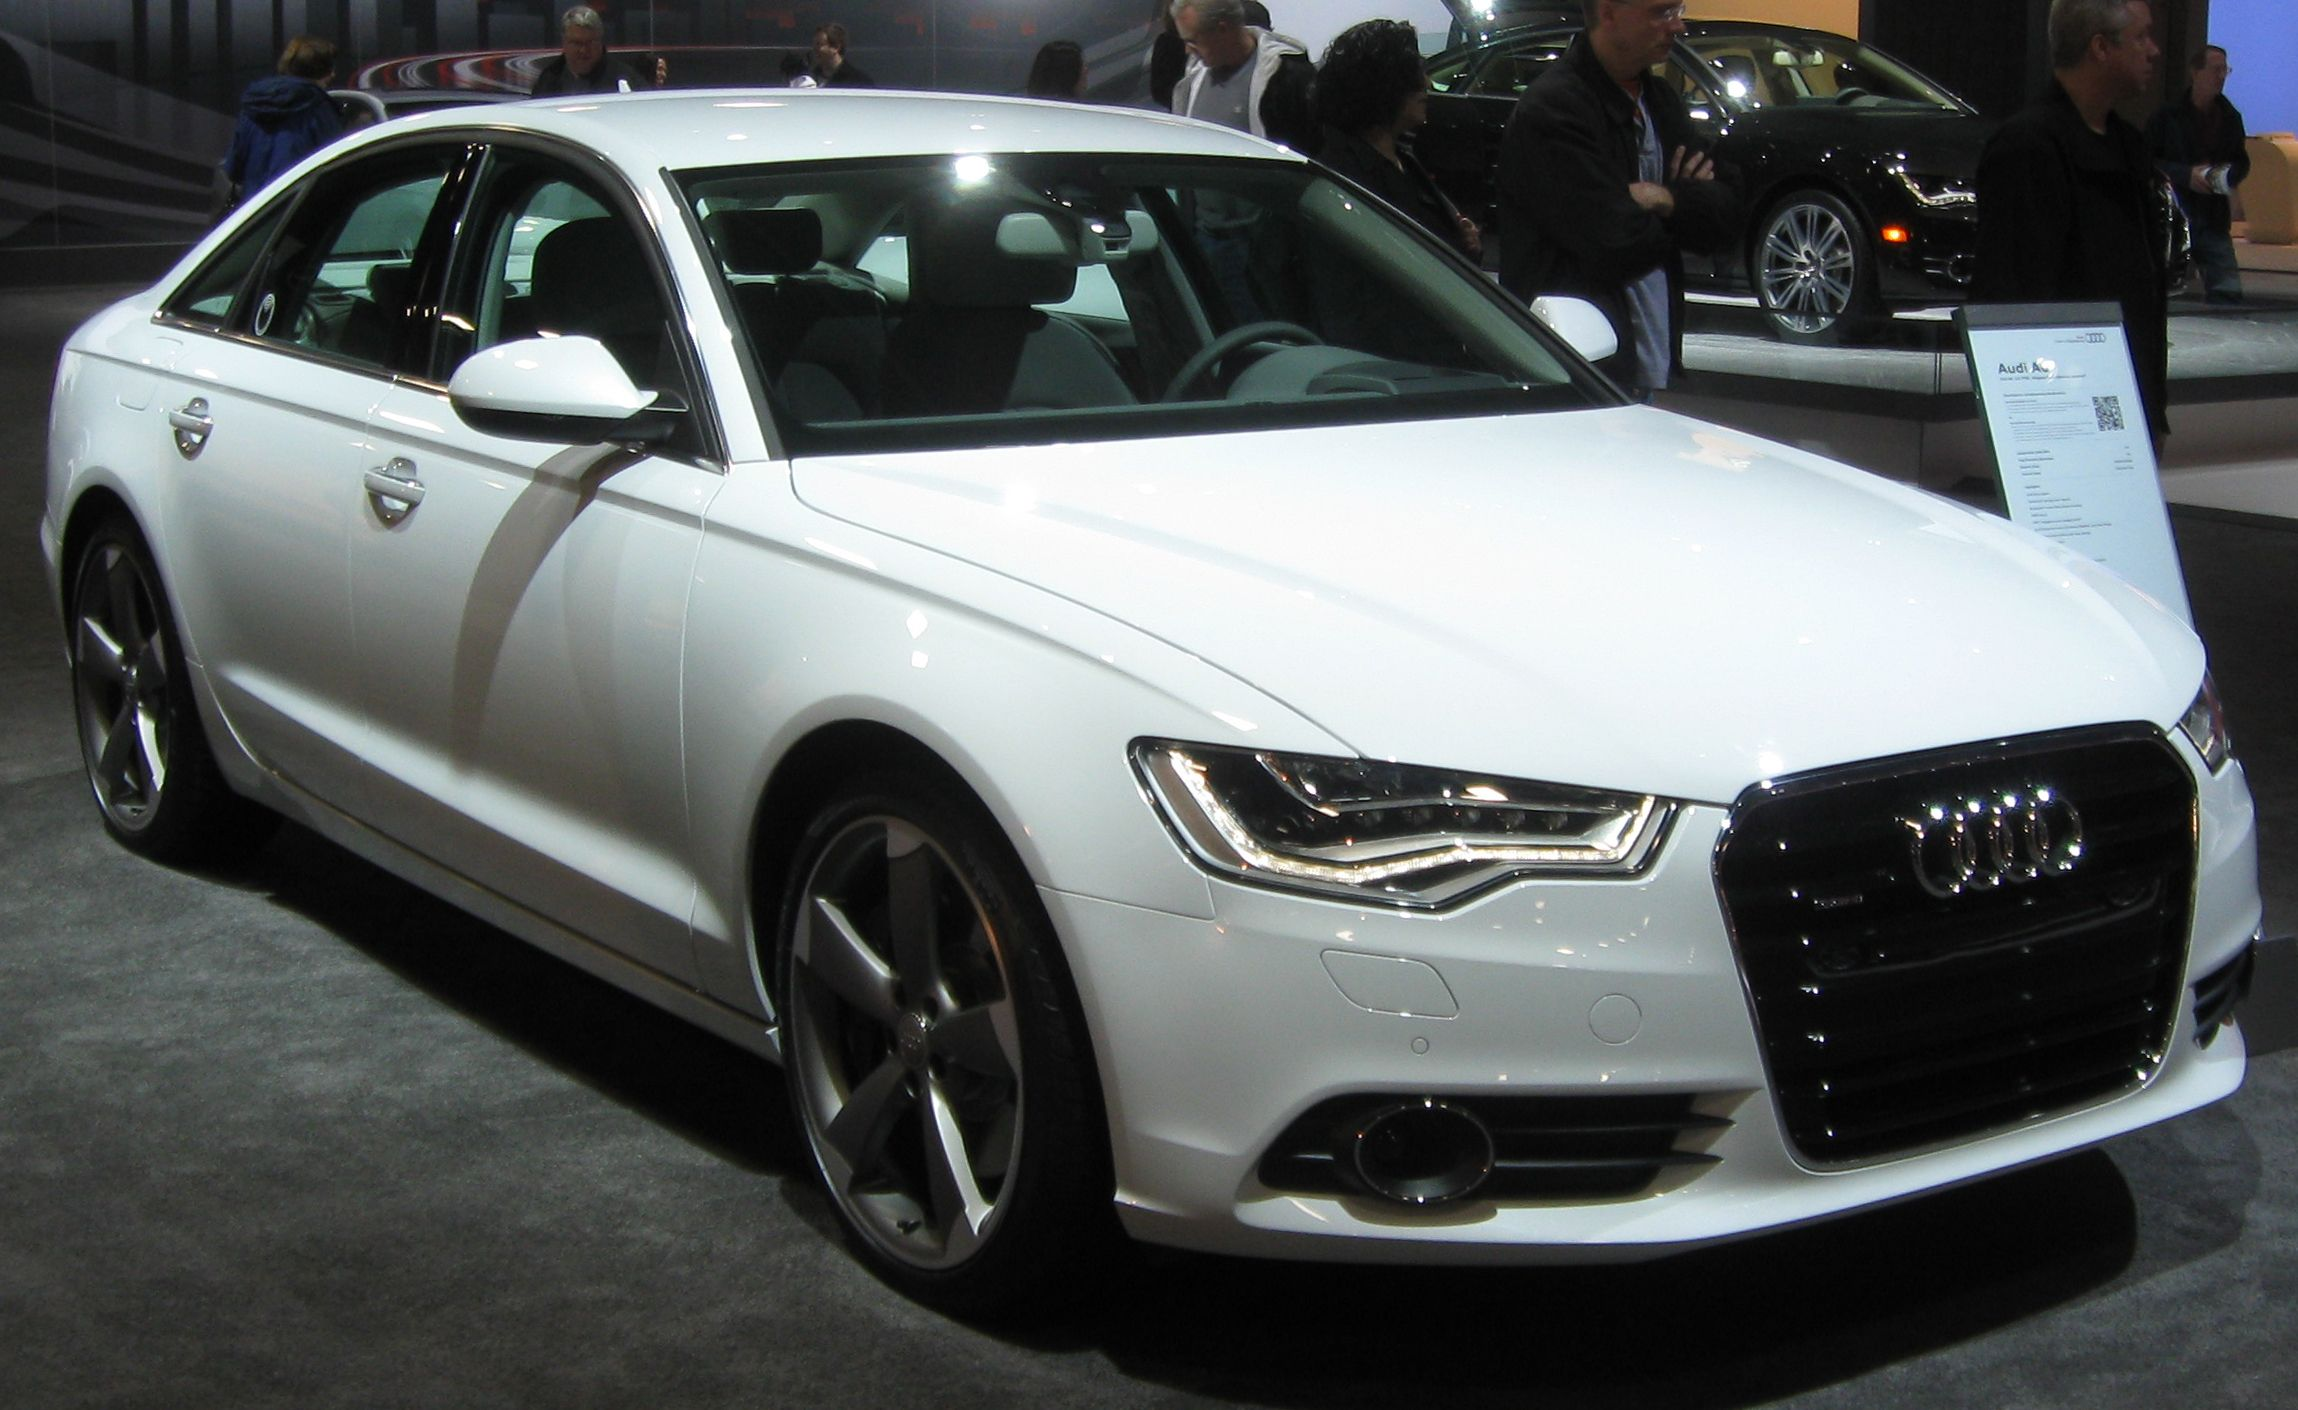 Charmant Audi A6 In 3M Satin White Aluminium Matt. | Audi A6 | Pinterest | Audi A6,  Car Wrap And Cars